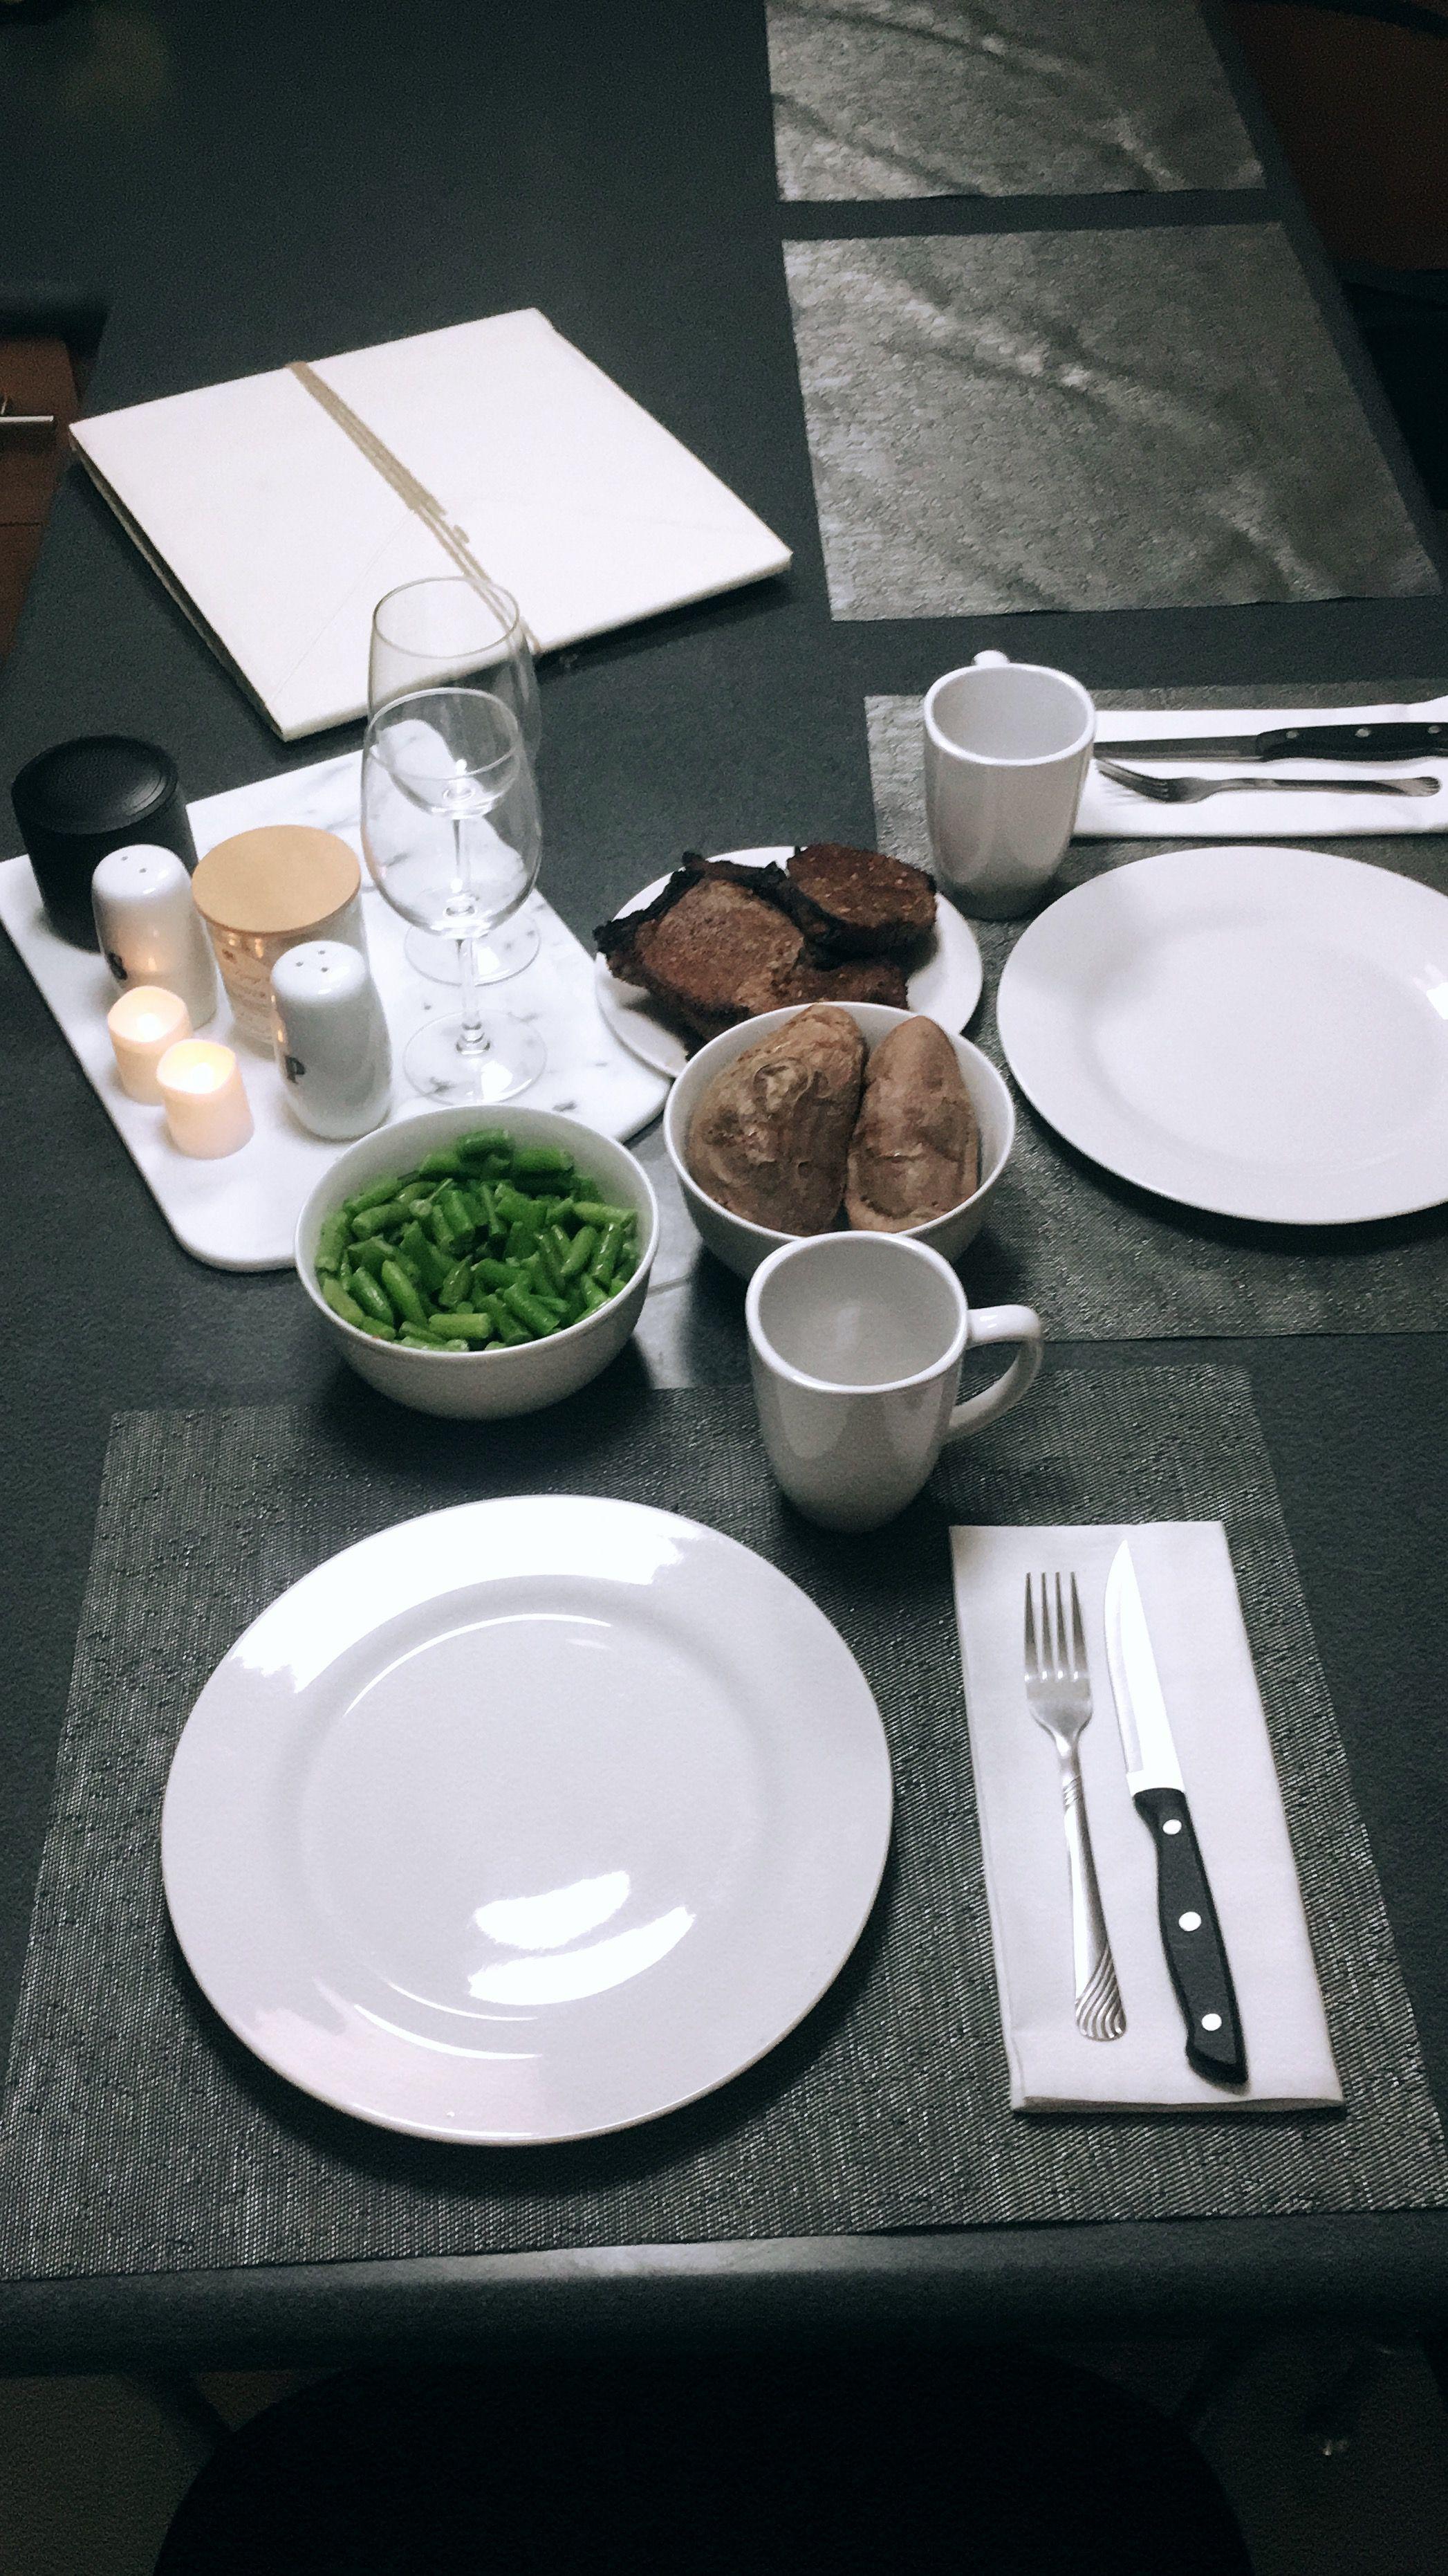 romantic dinner • welcome home • surprise • boyfriend ...